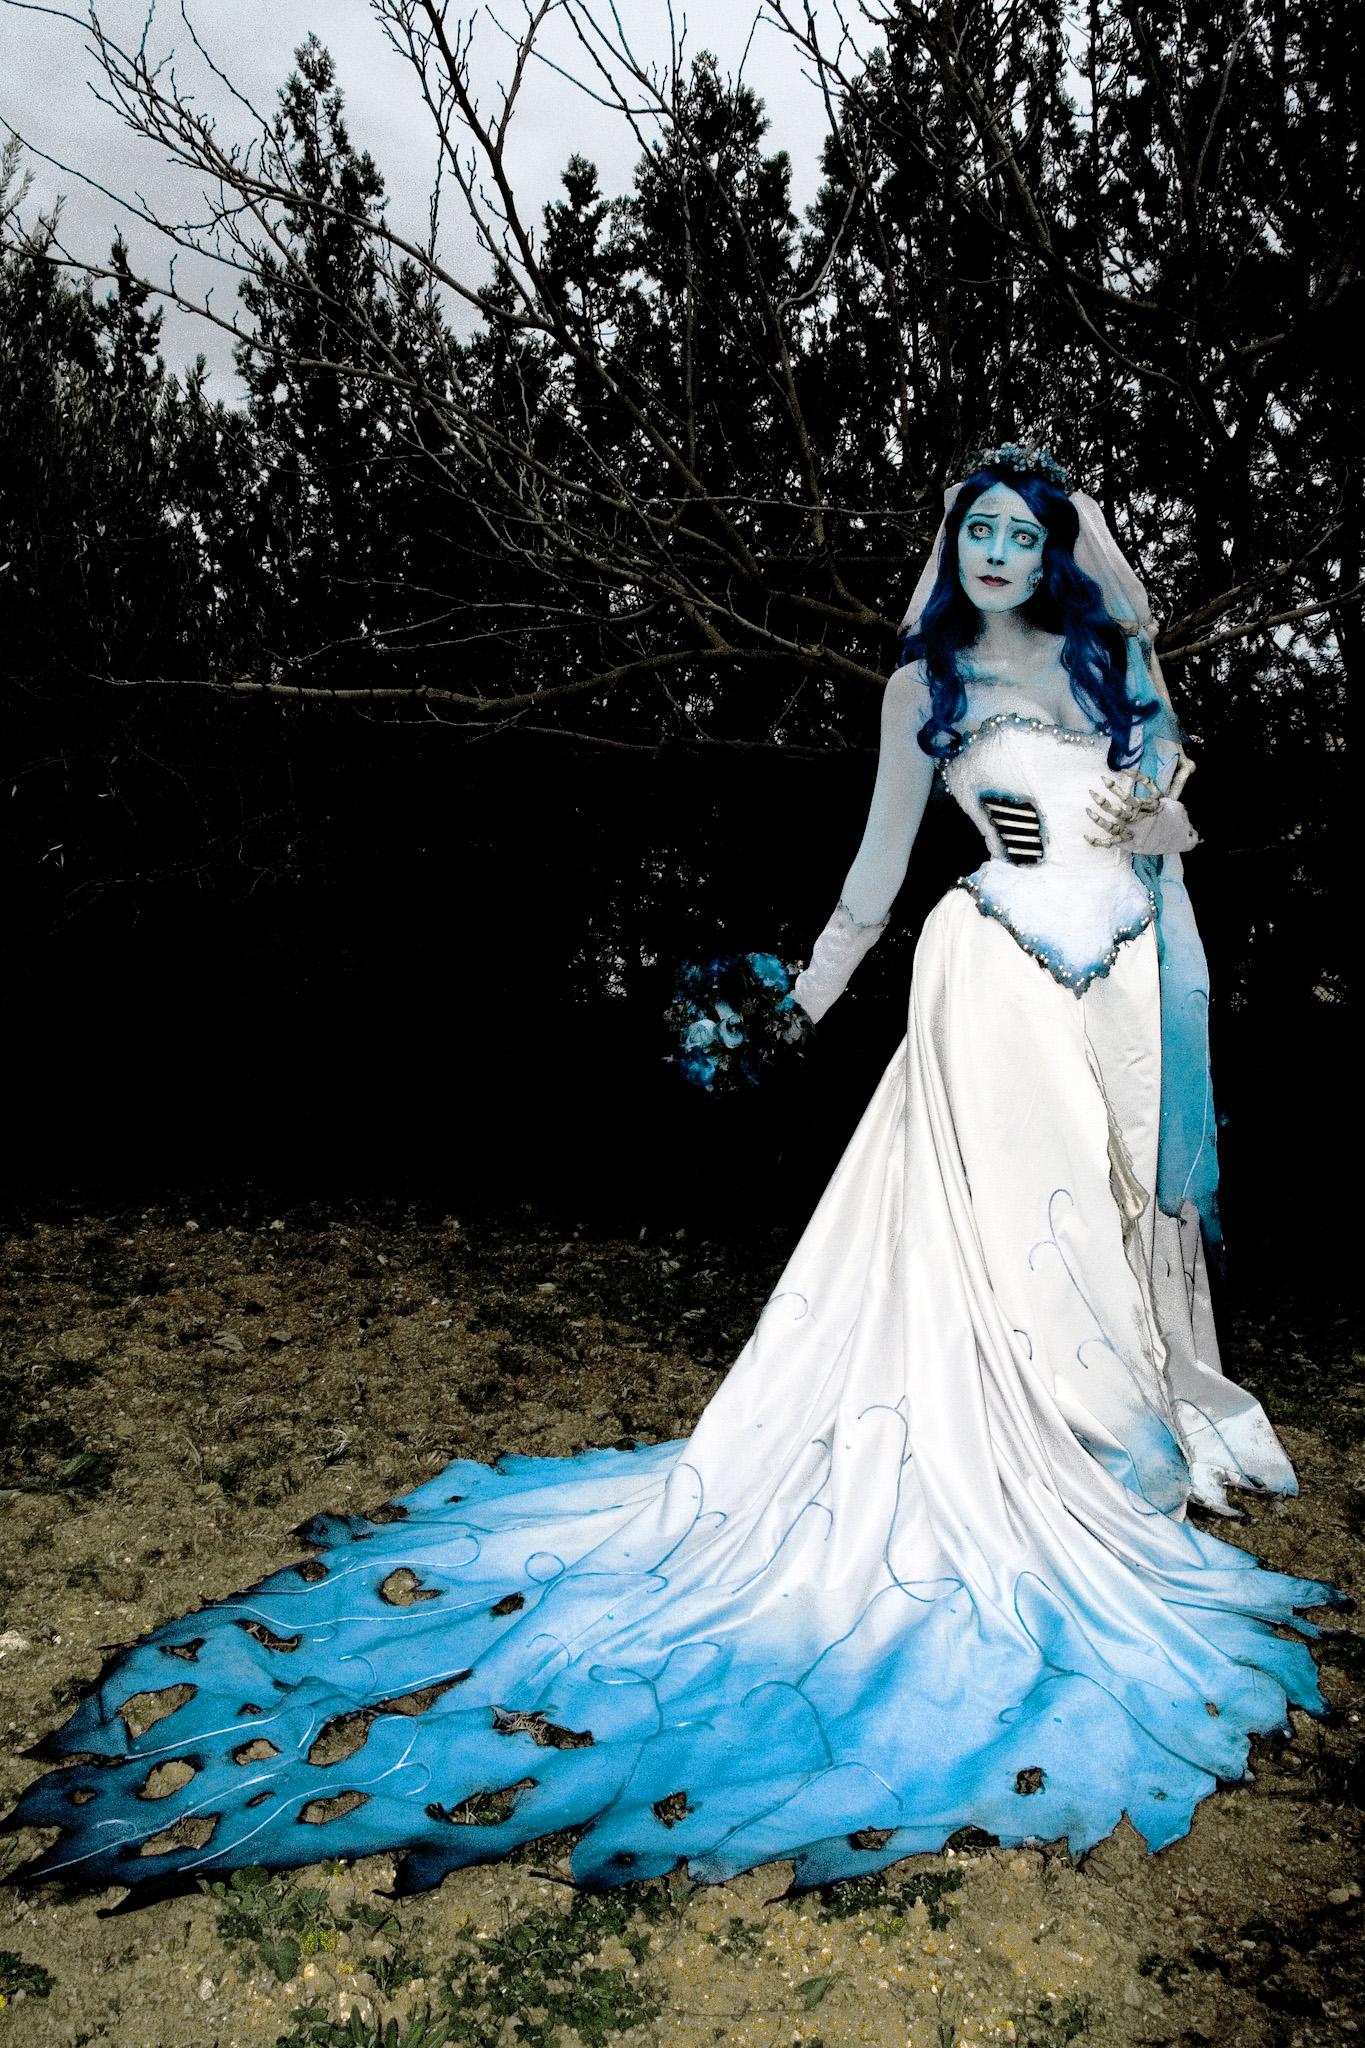 Corpse Bride Halloween Costume Diy.Corpse Bride By Meitotoro On Deviantart